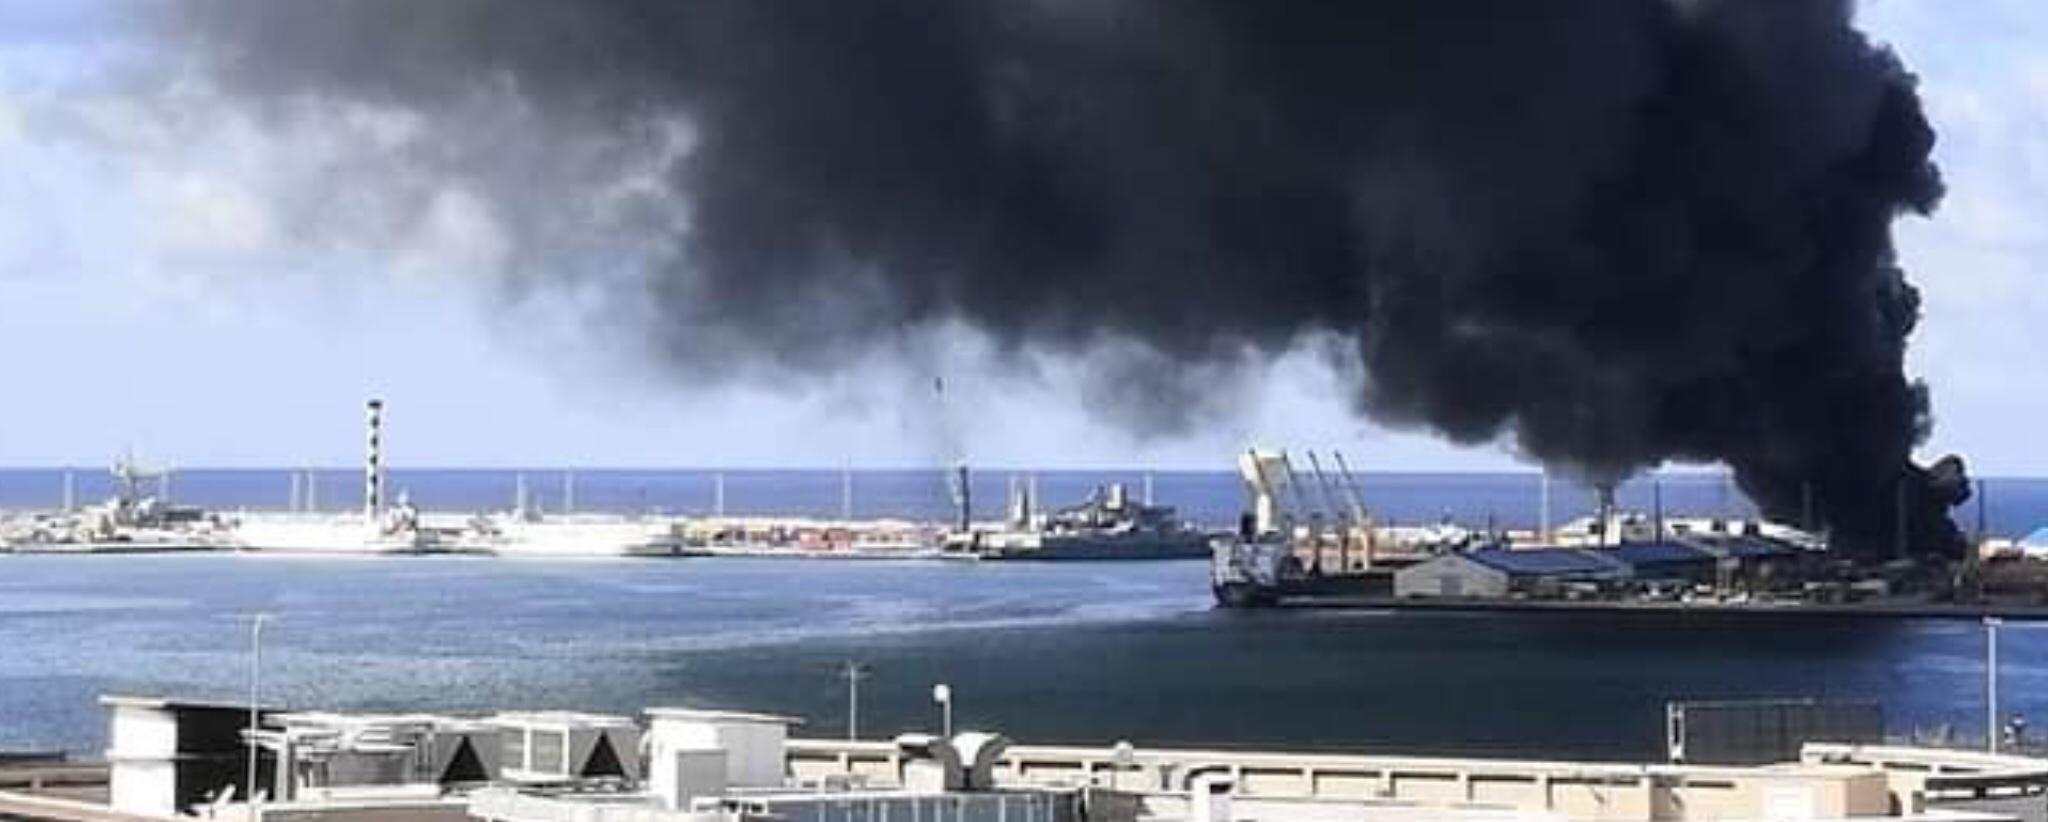 Borrell calls Libyans to stop hostilities